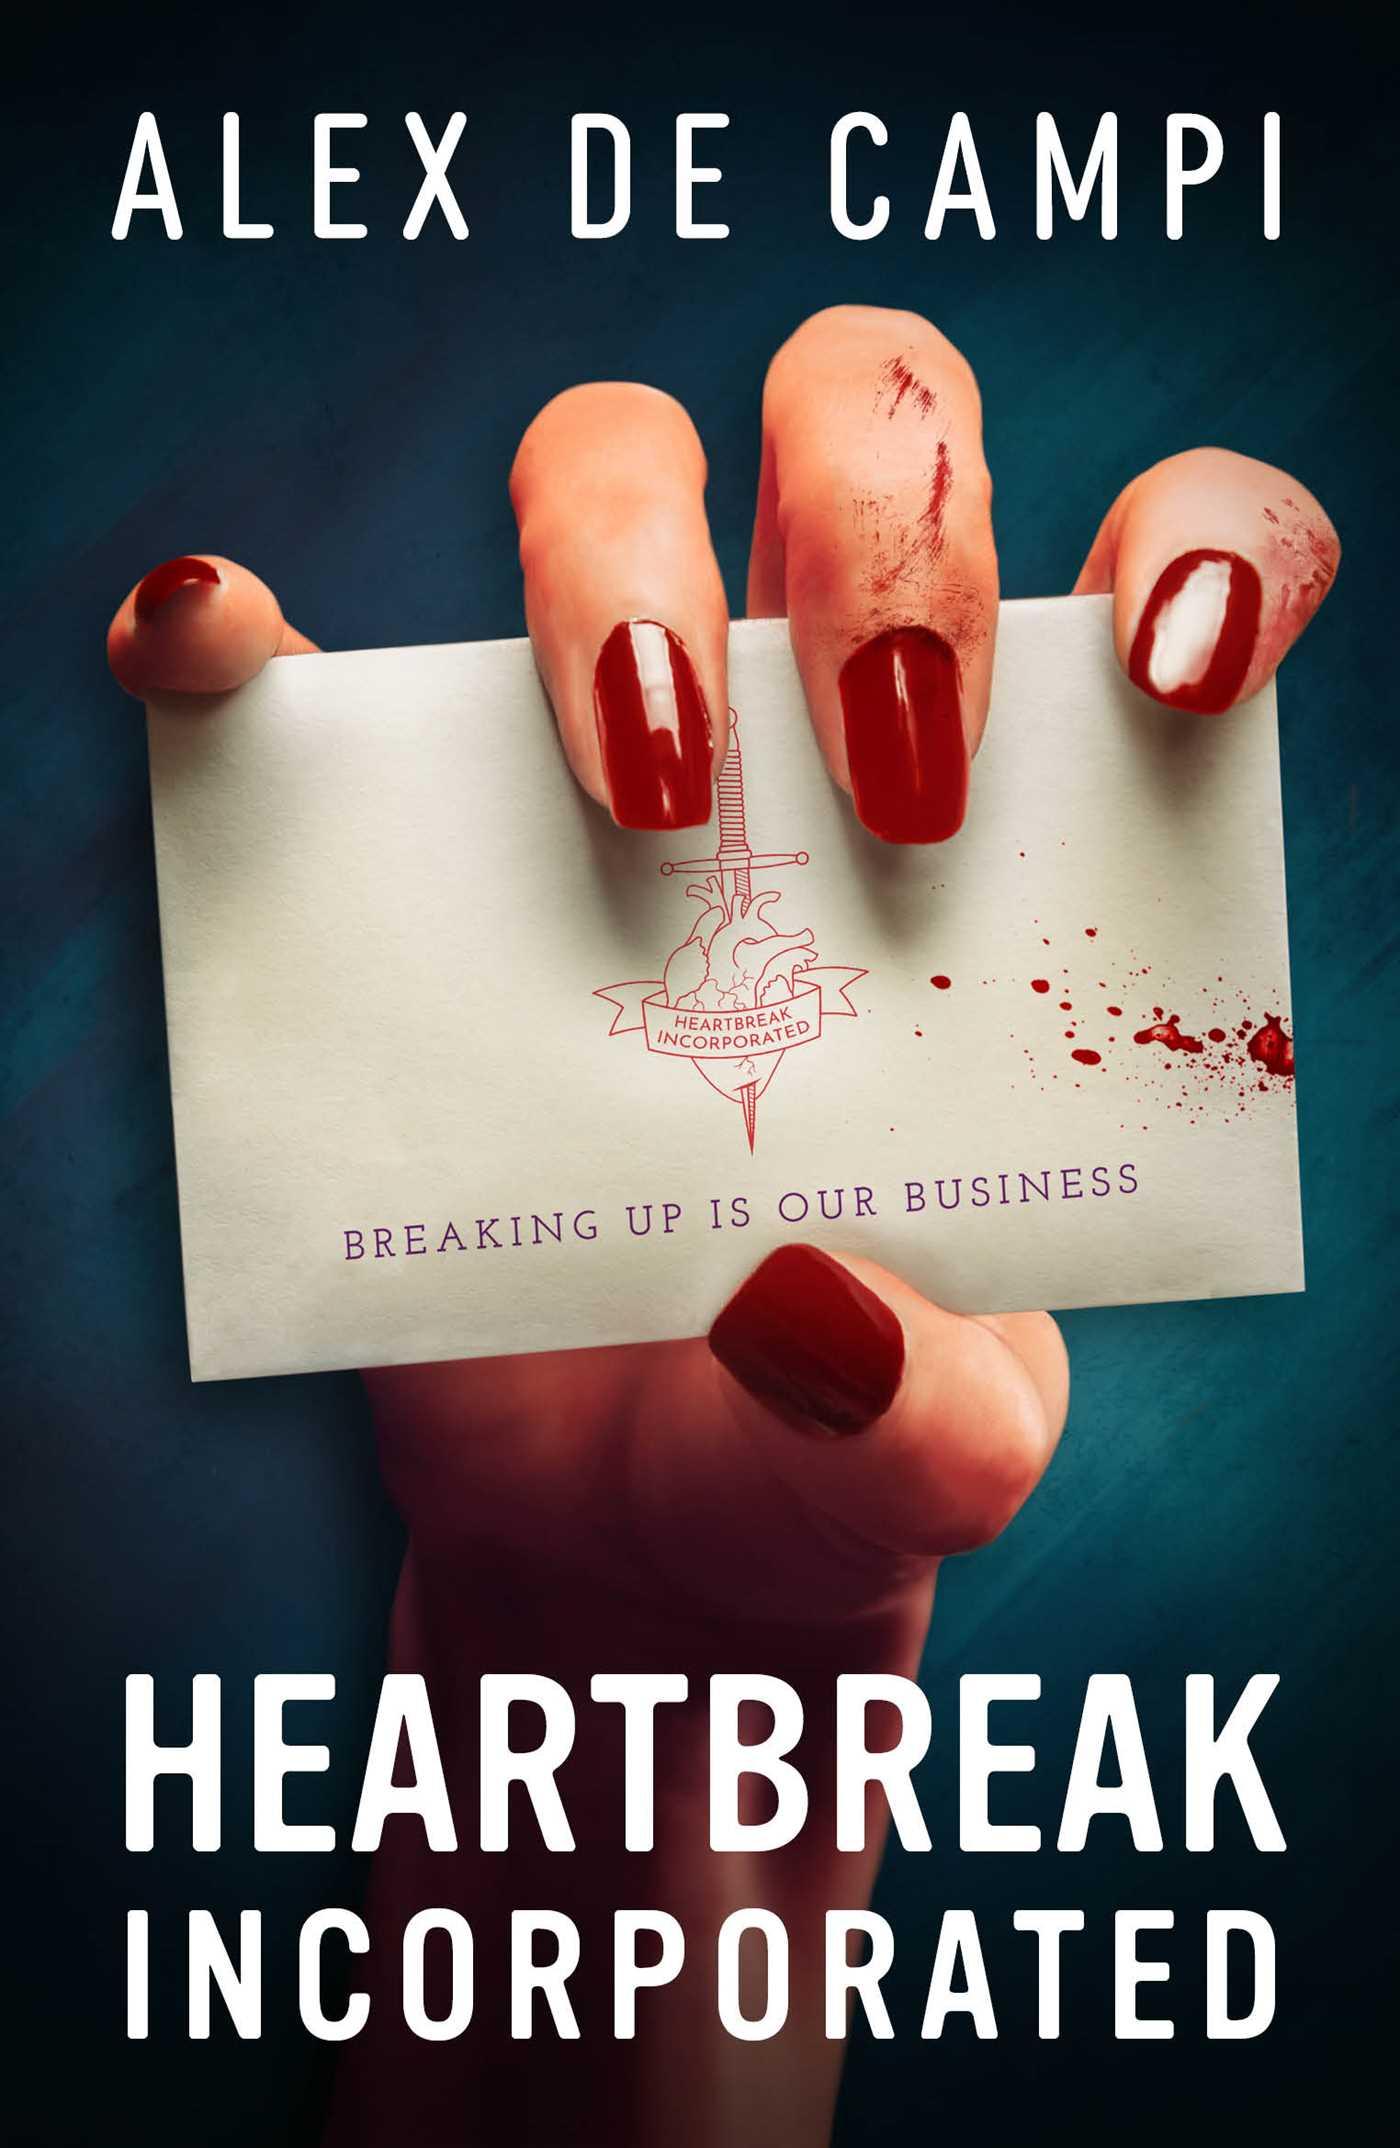 Heartbreak Incorporated, Occult, Mystery, Sex, Romance, Adult, Alex de Campi, Nails, Blood, Card